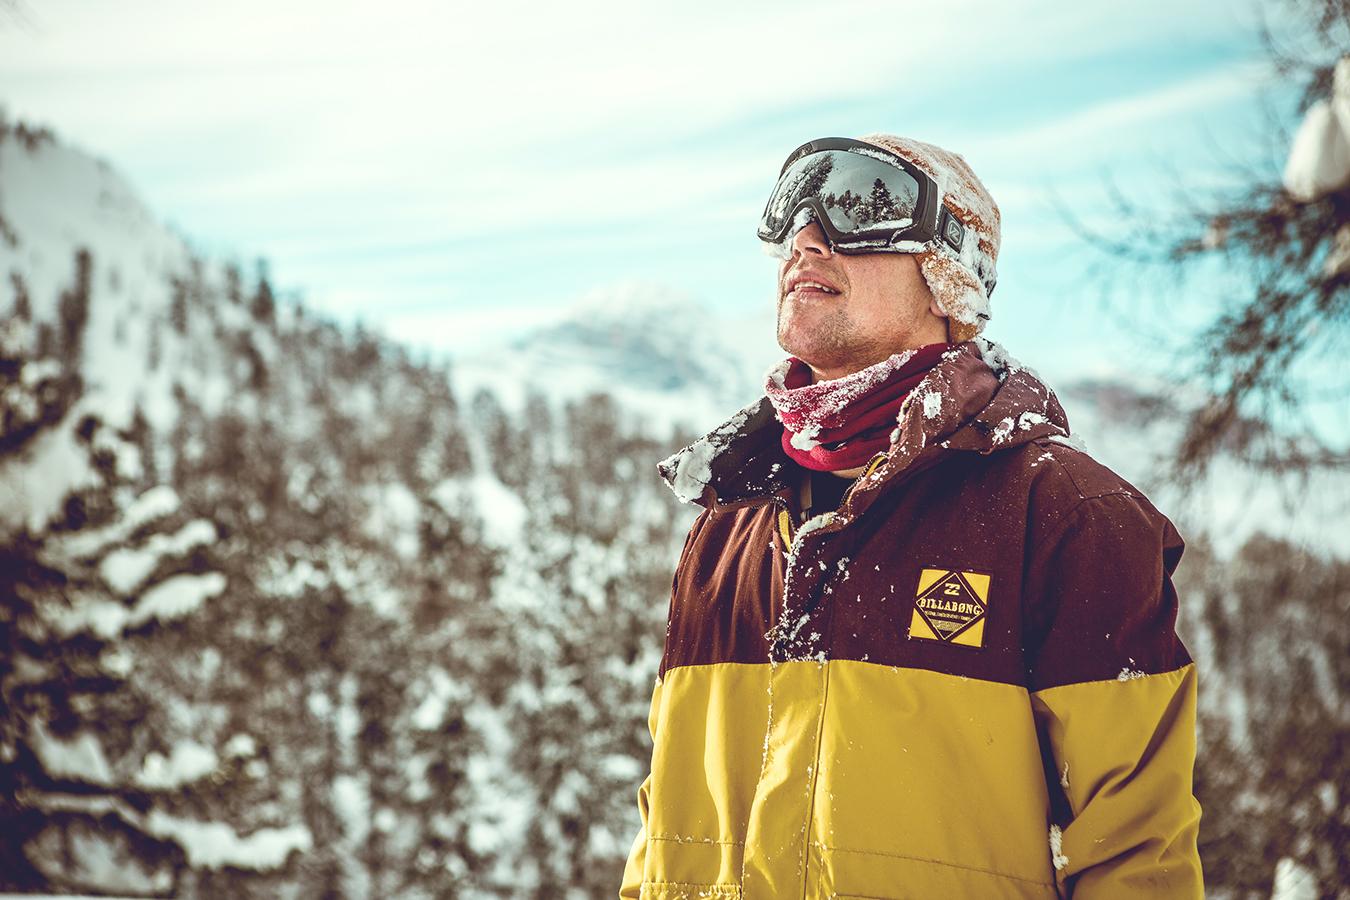 SylvainBourbousson_Snowboard_SilvanoZeiter.jpg